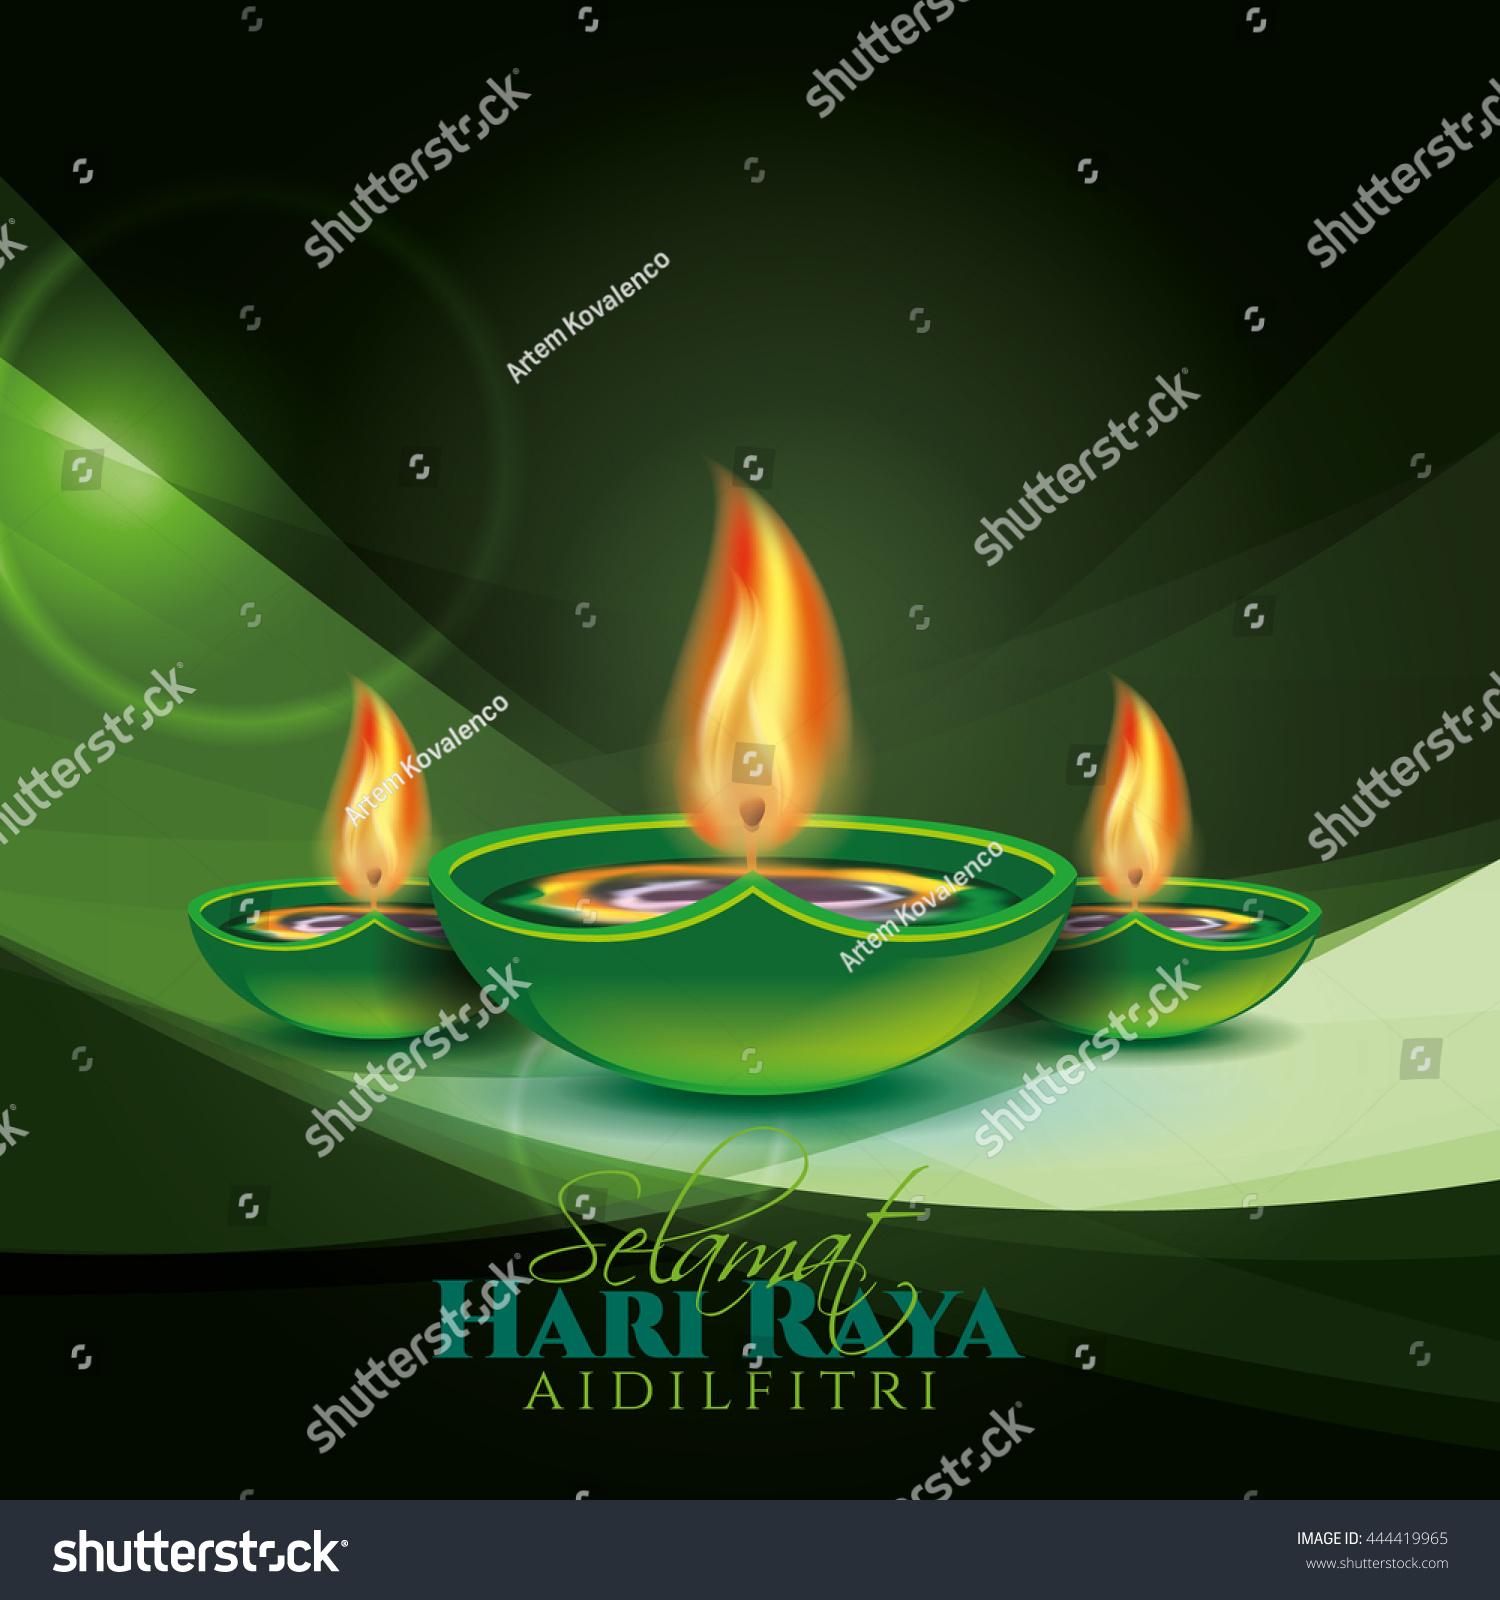 Stock Vector Illustration Selamat Hari Raya Aidilfitri Arabic Feast Translation Celebration Of Ketupat Dumpling Graphic